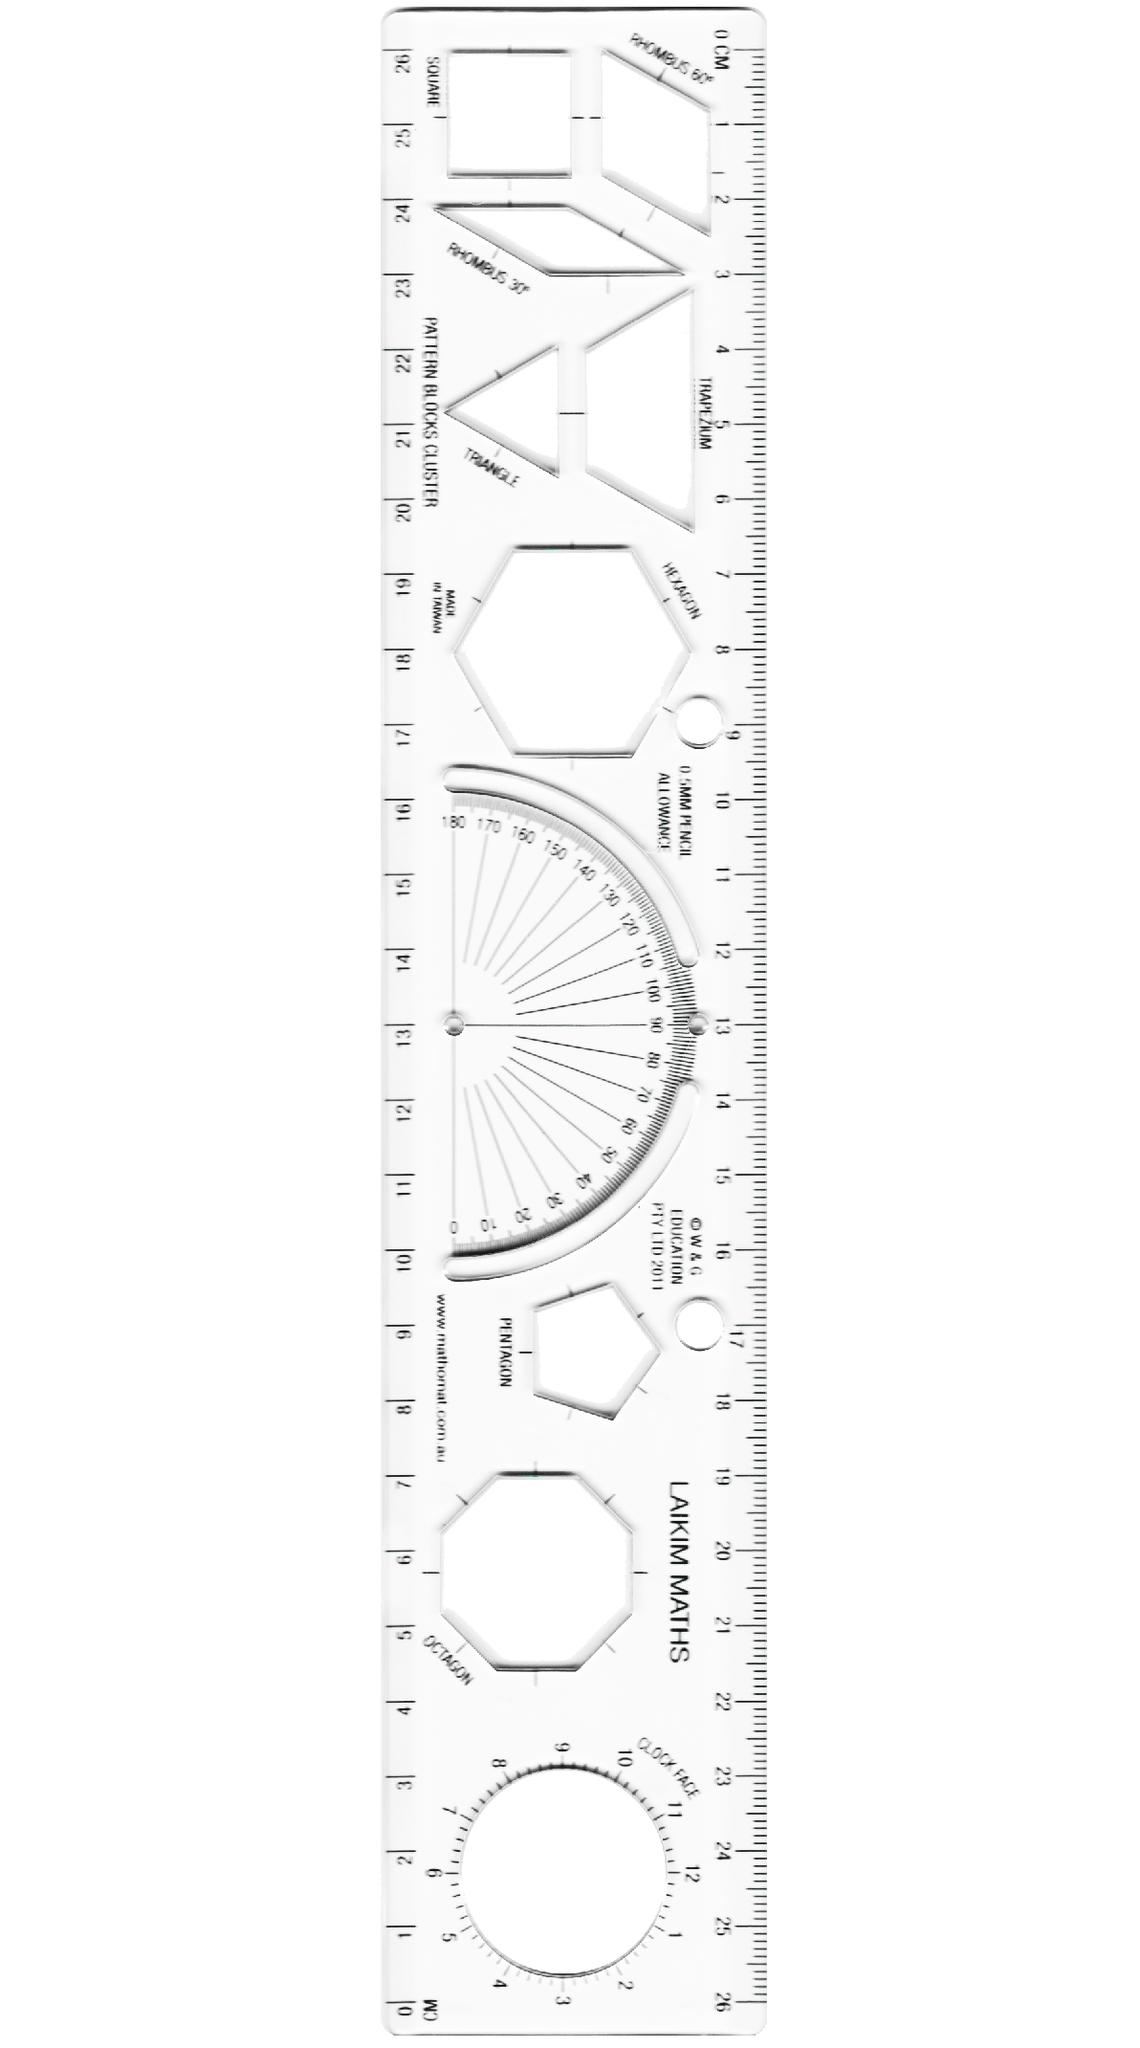 1140x2048 Laikim Maths Ruler For Primary School Students Mathomat Geometry